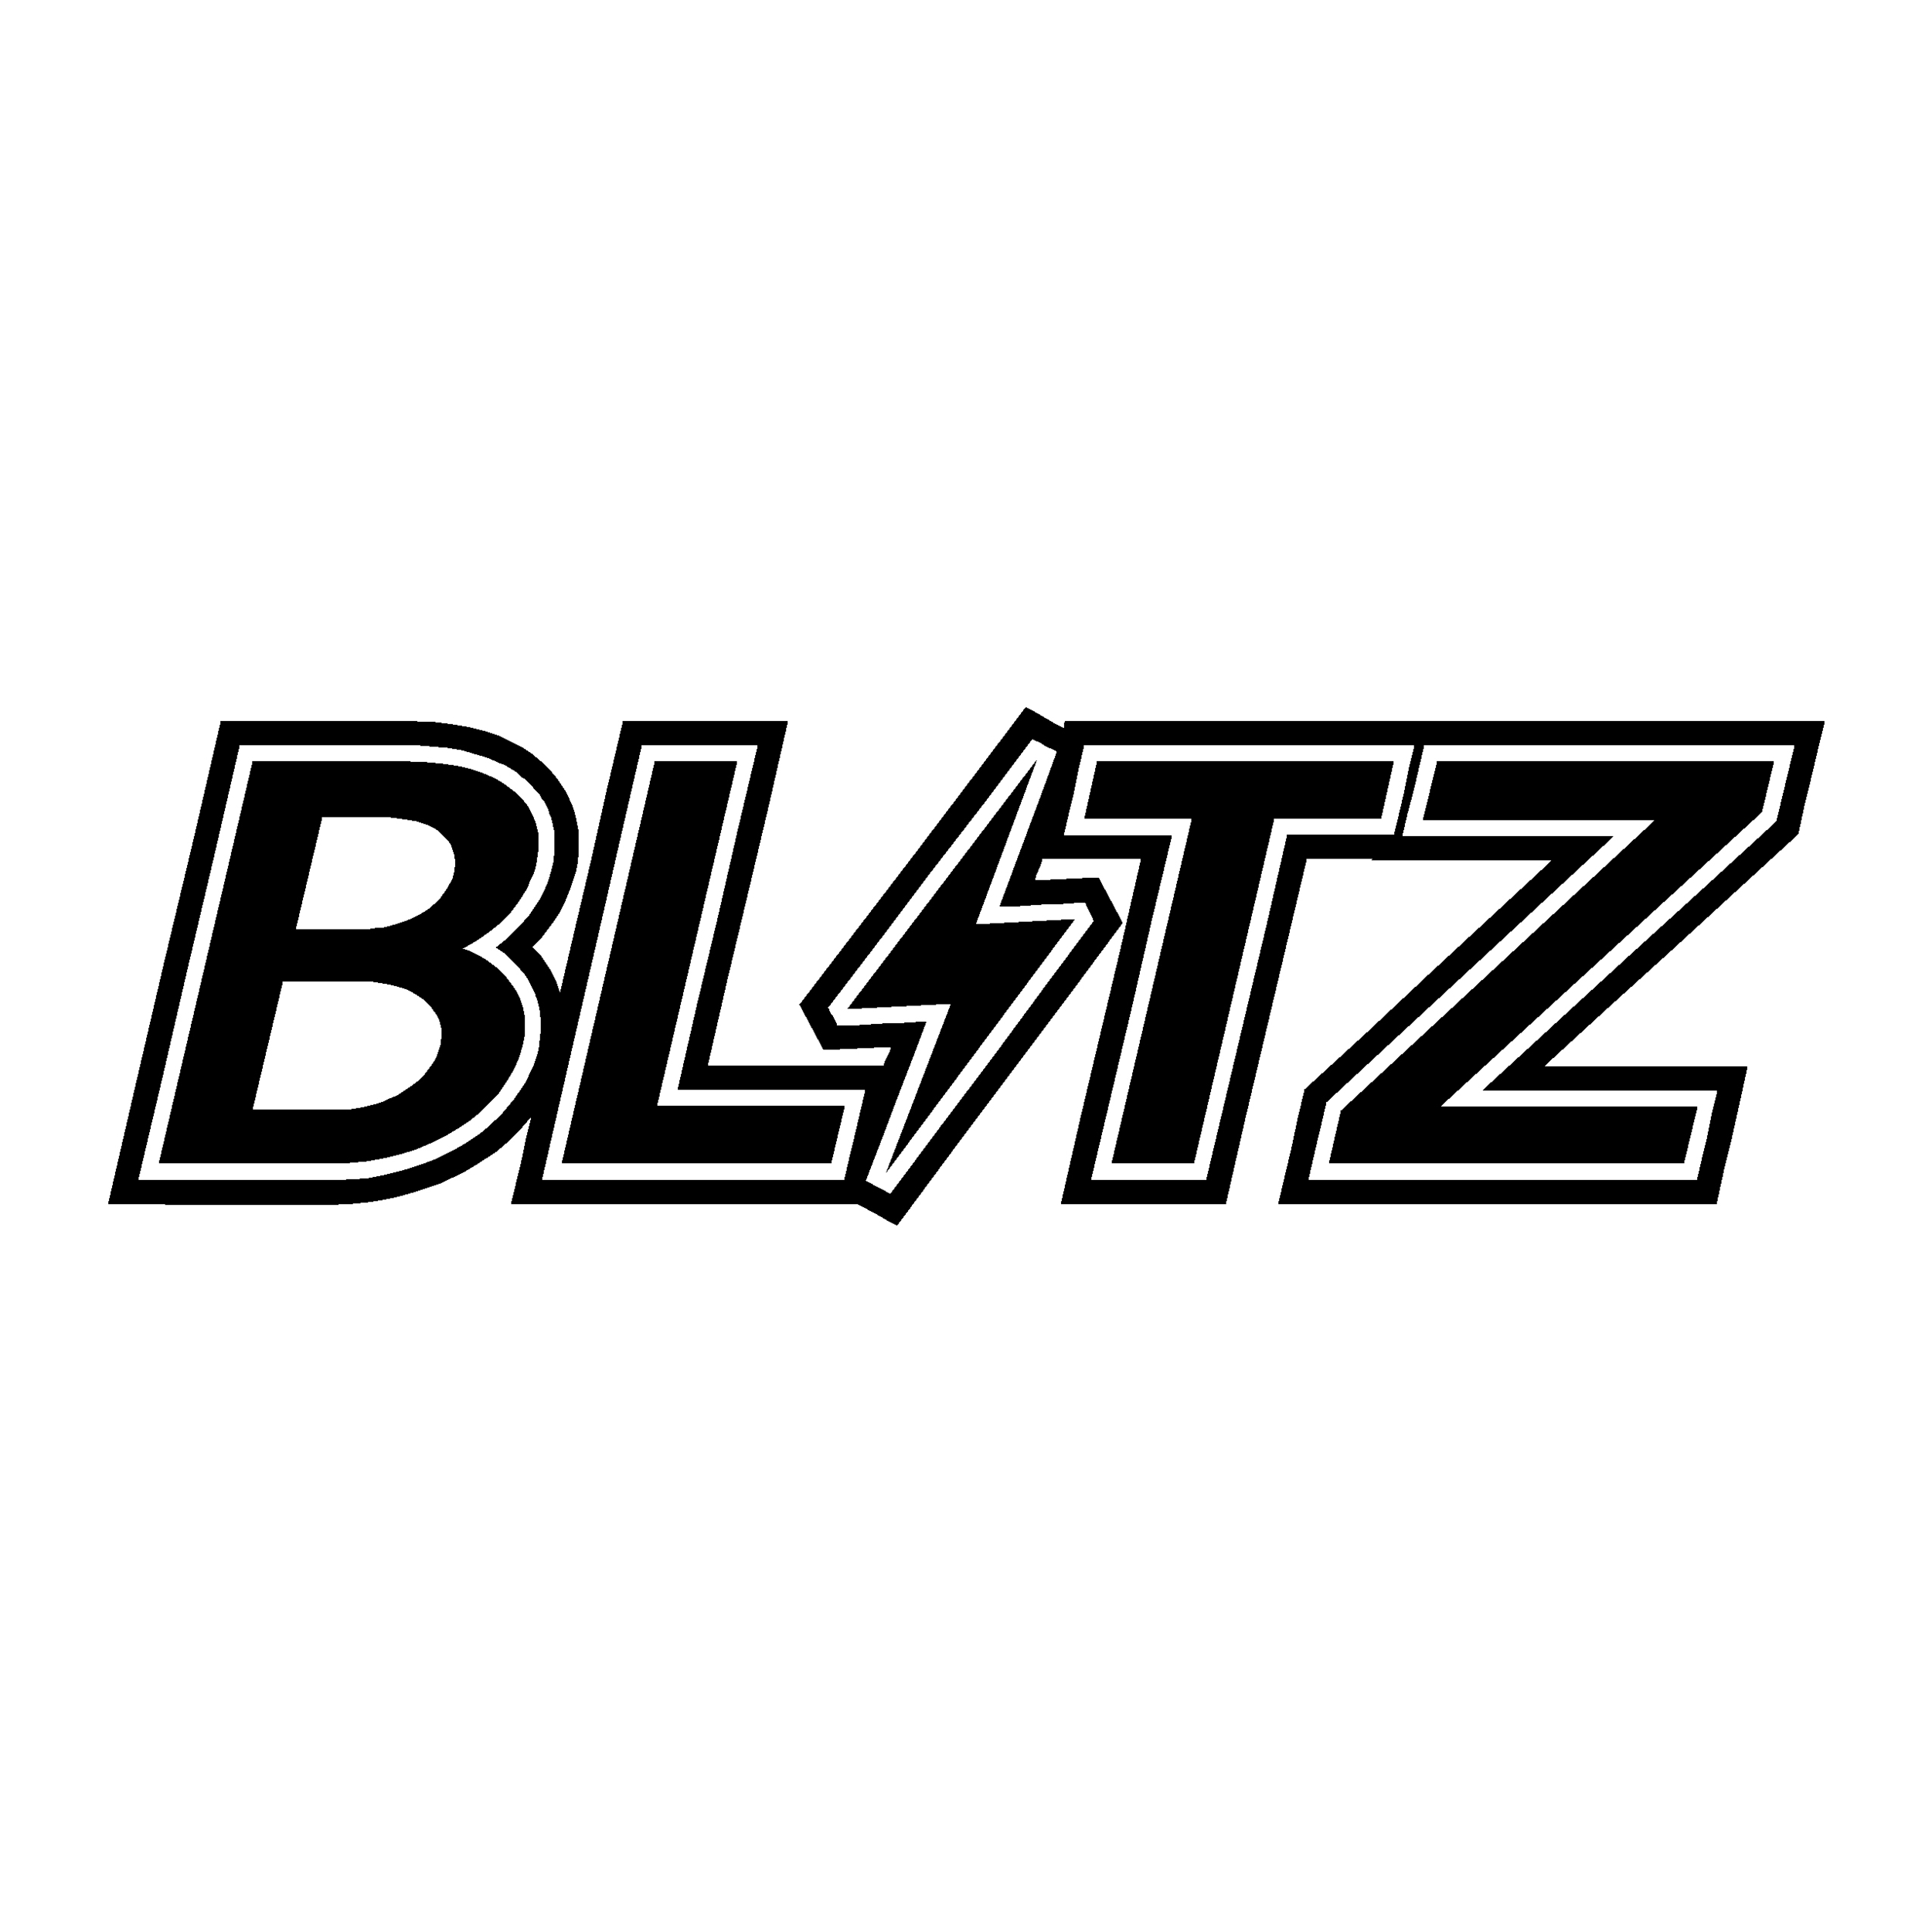 sticker blitz ref 2 tuning auto moto camion competition deco rallye autocollant